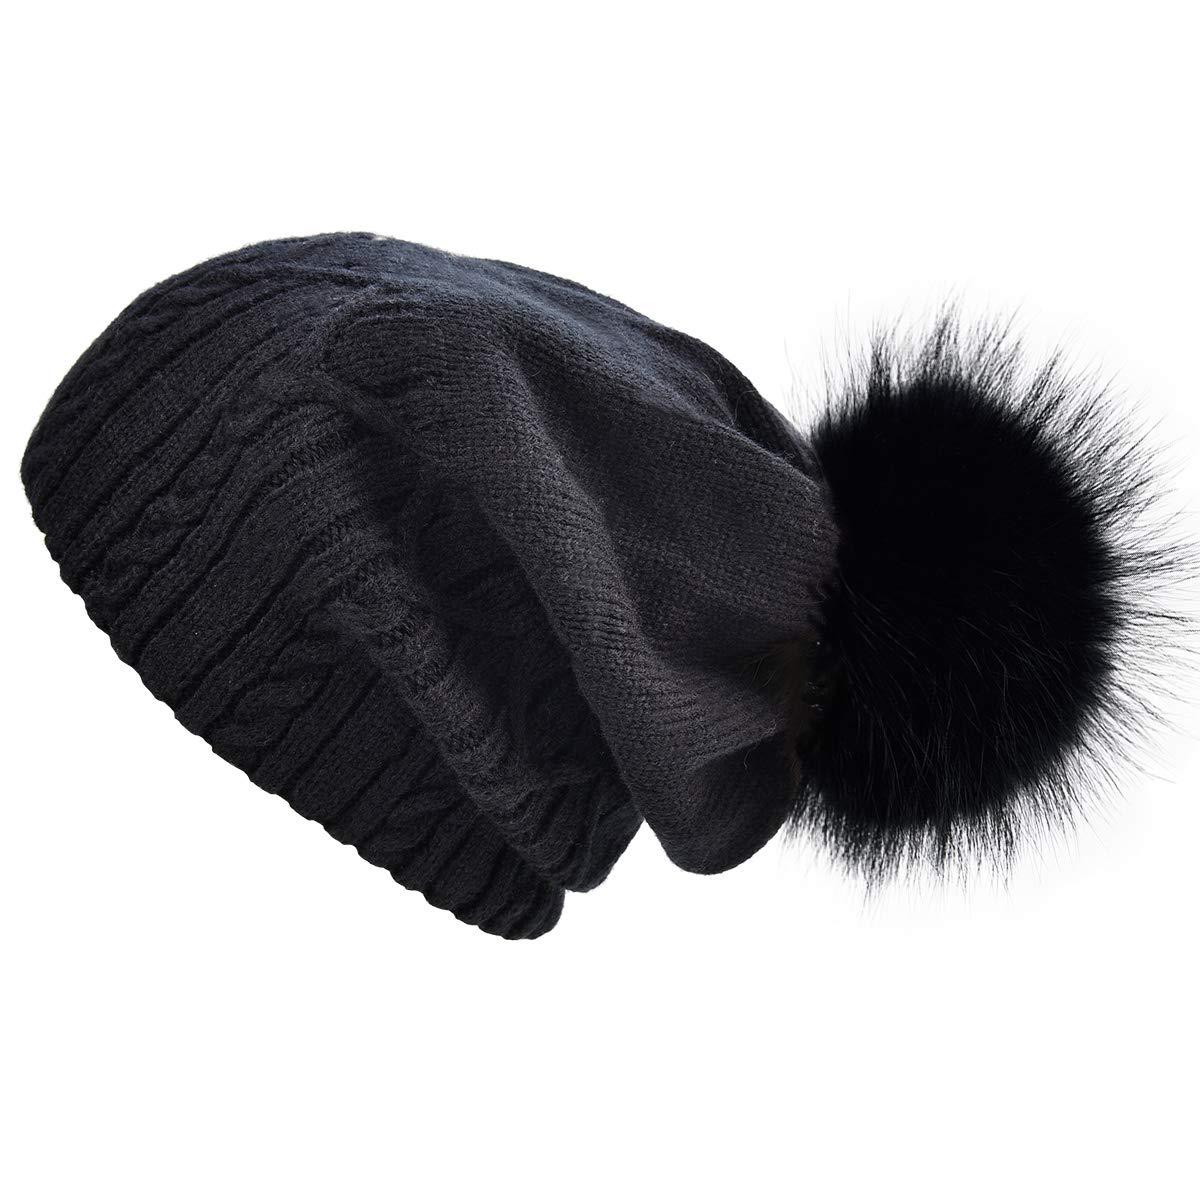 Black+black Racoon Pom Pom SOMALER Winter Hats Women Real Fur pom pom Beanie Slouchy Beanies Kintted hat 6 colors